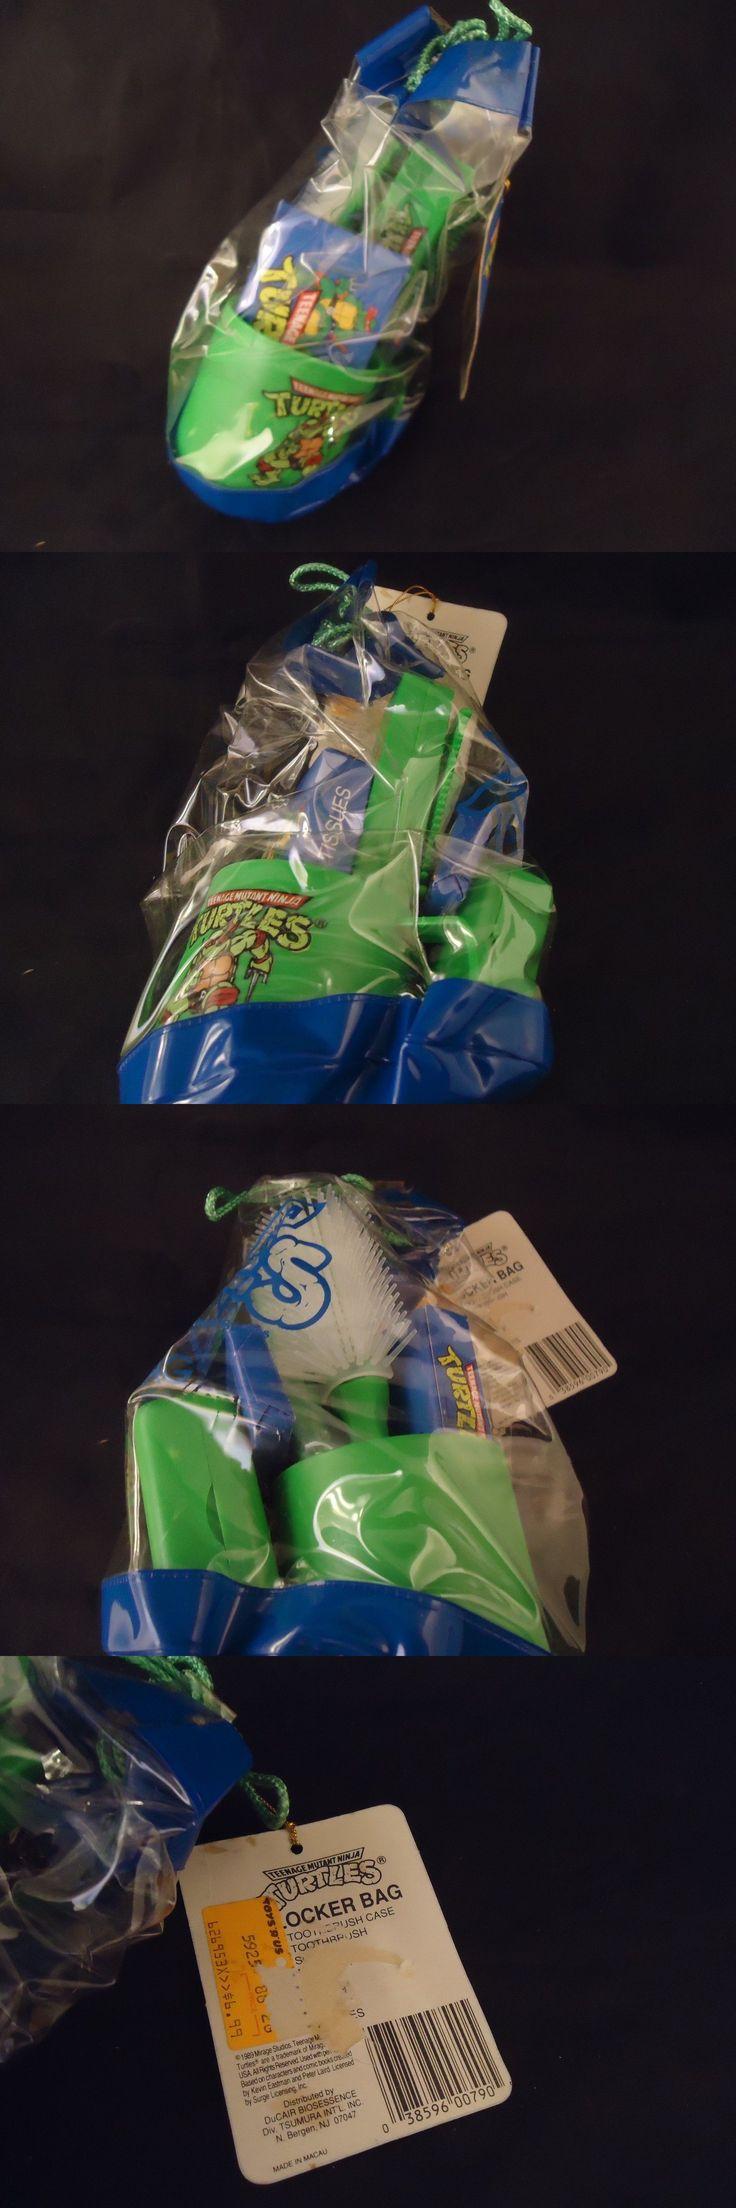 Bath 115624: Retro Teenage Mutant Ninja Turtles Locker Bag Bath Kit Tmnt Brush Soap Cup New -> BUY IT NOW ONLY: $34.99 on eBay!